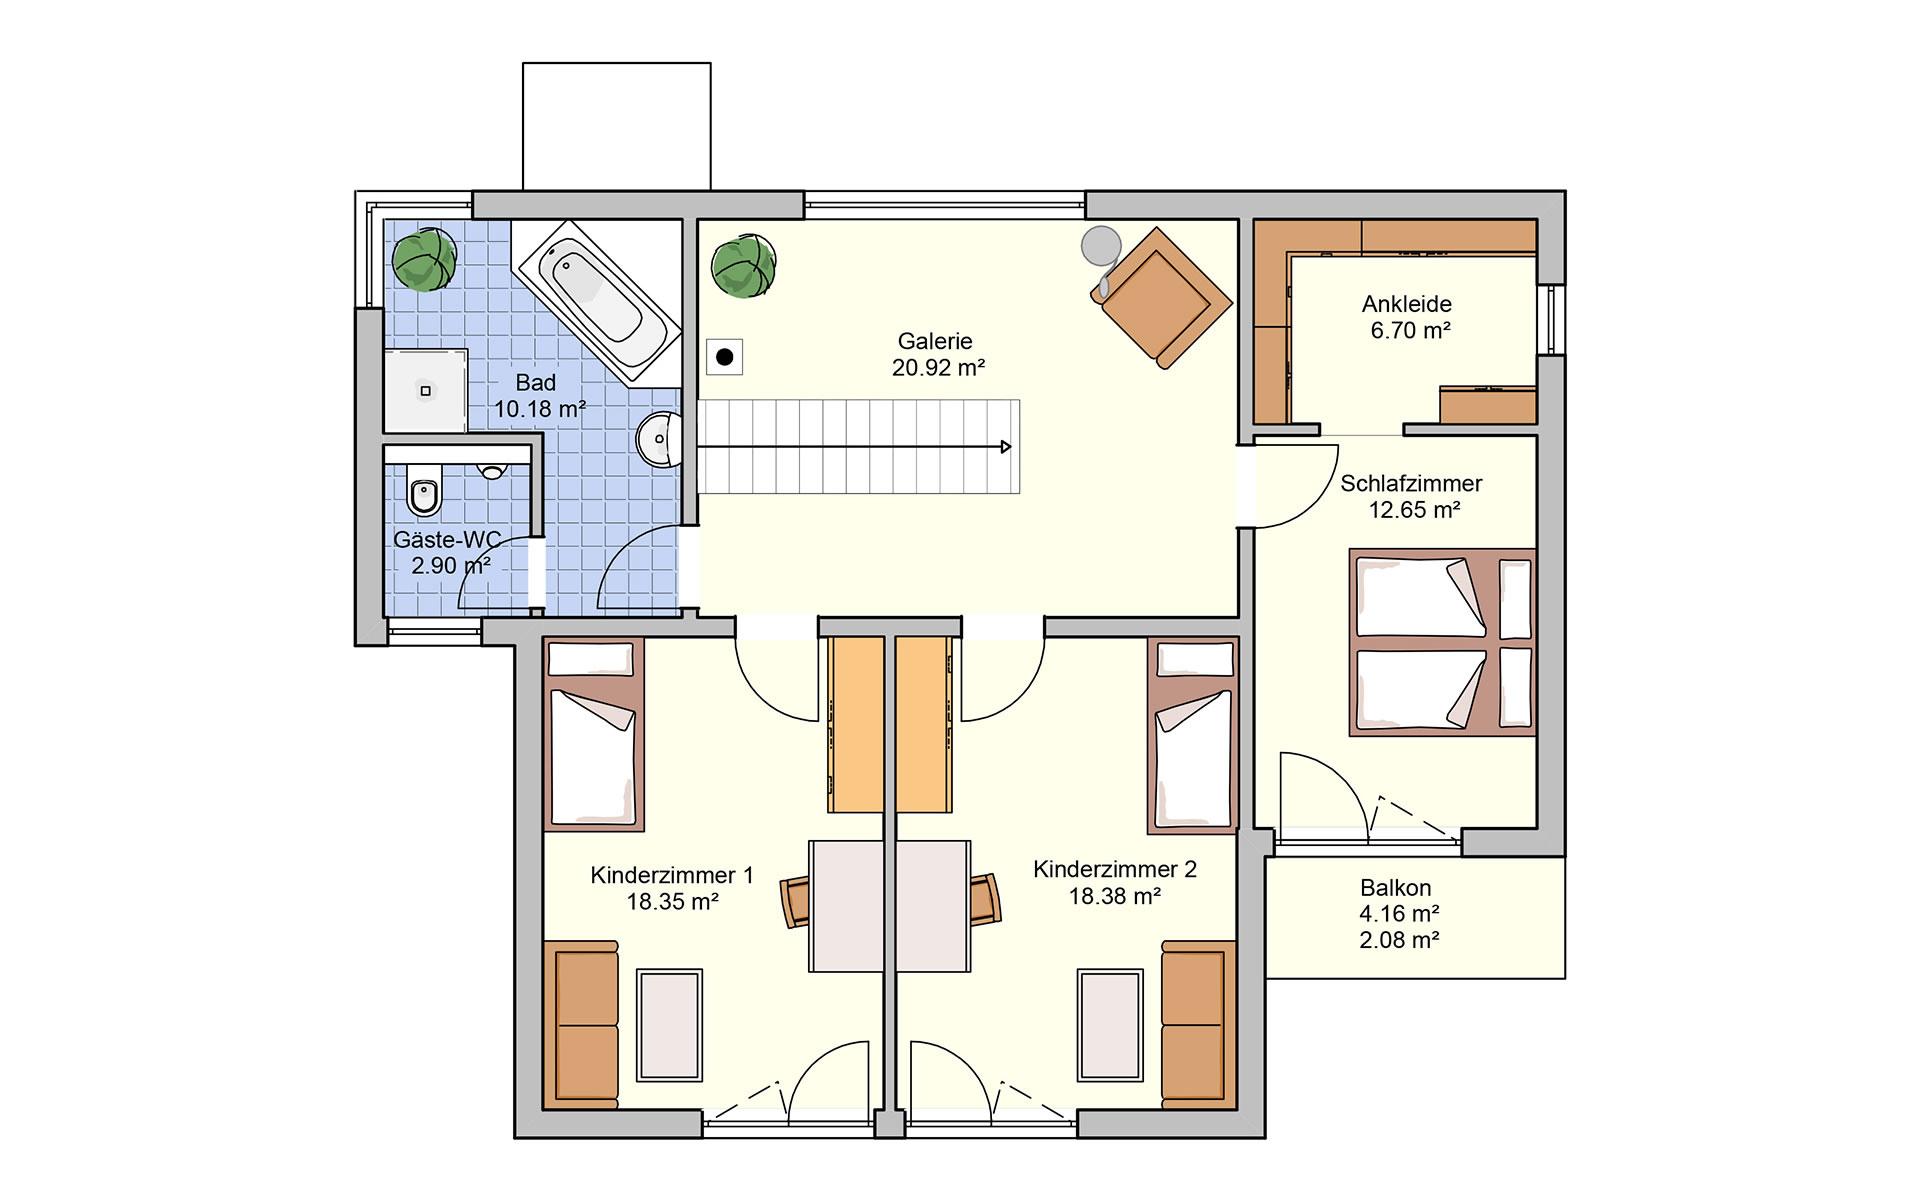 Obergeschoss Linea von Fingerhut Haus GmbH & Co. KG